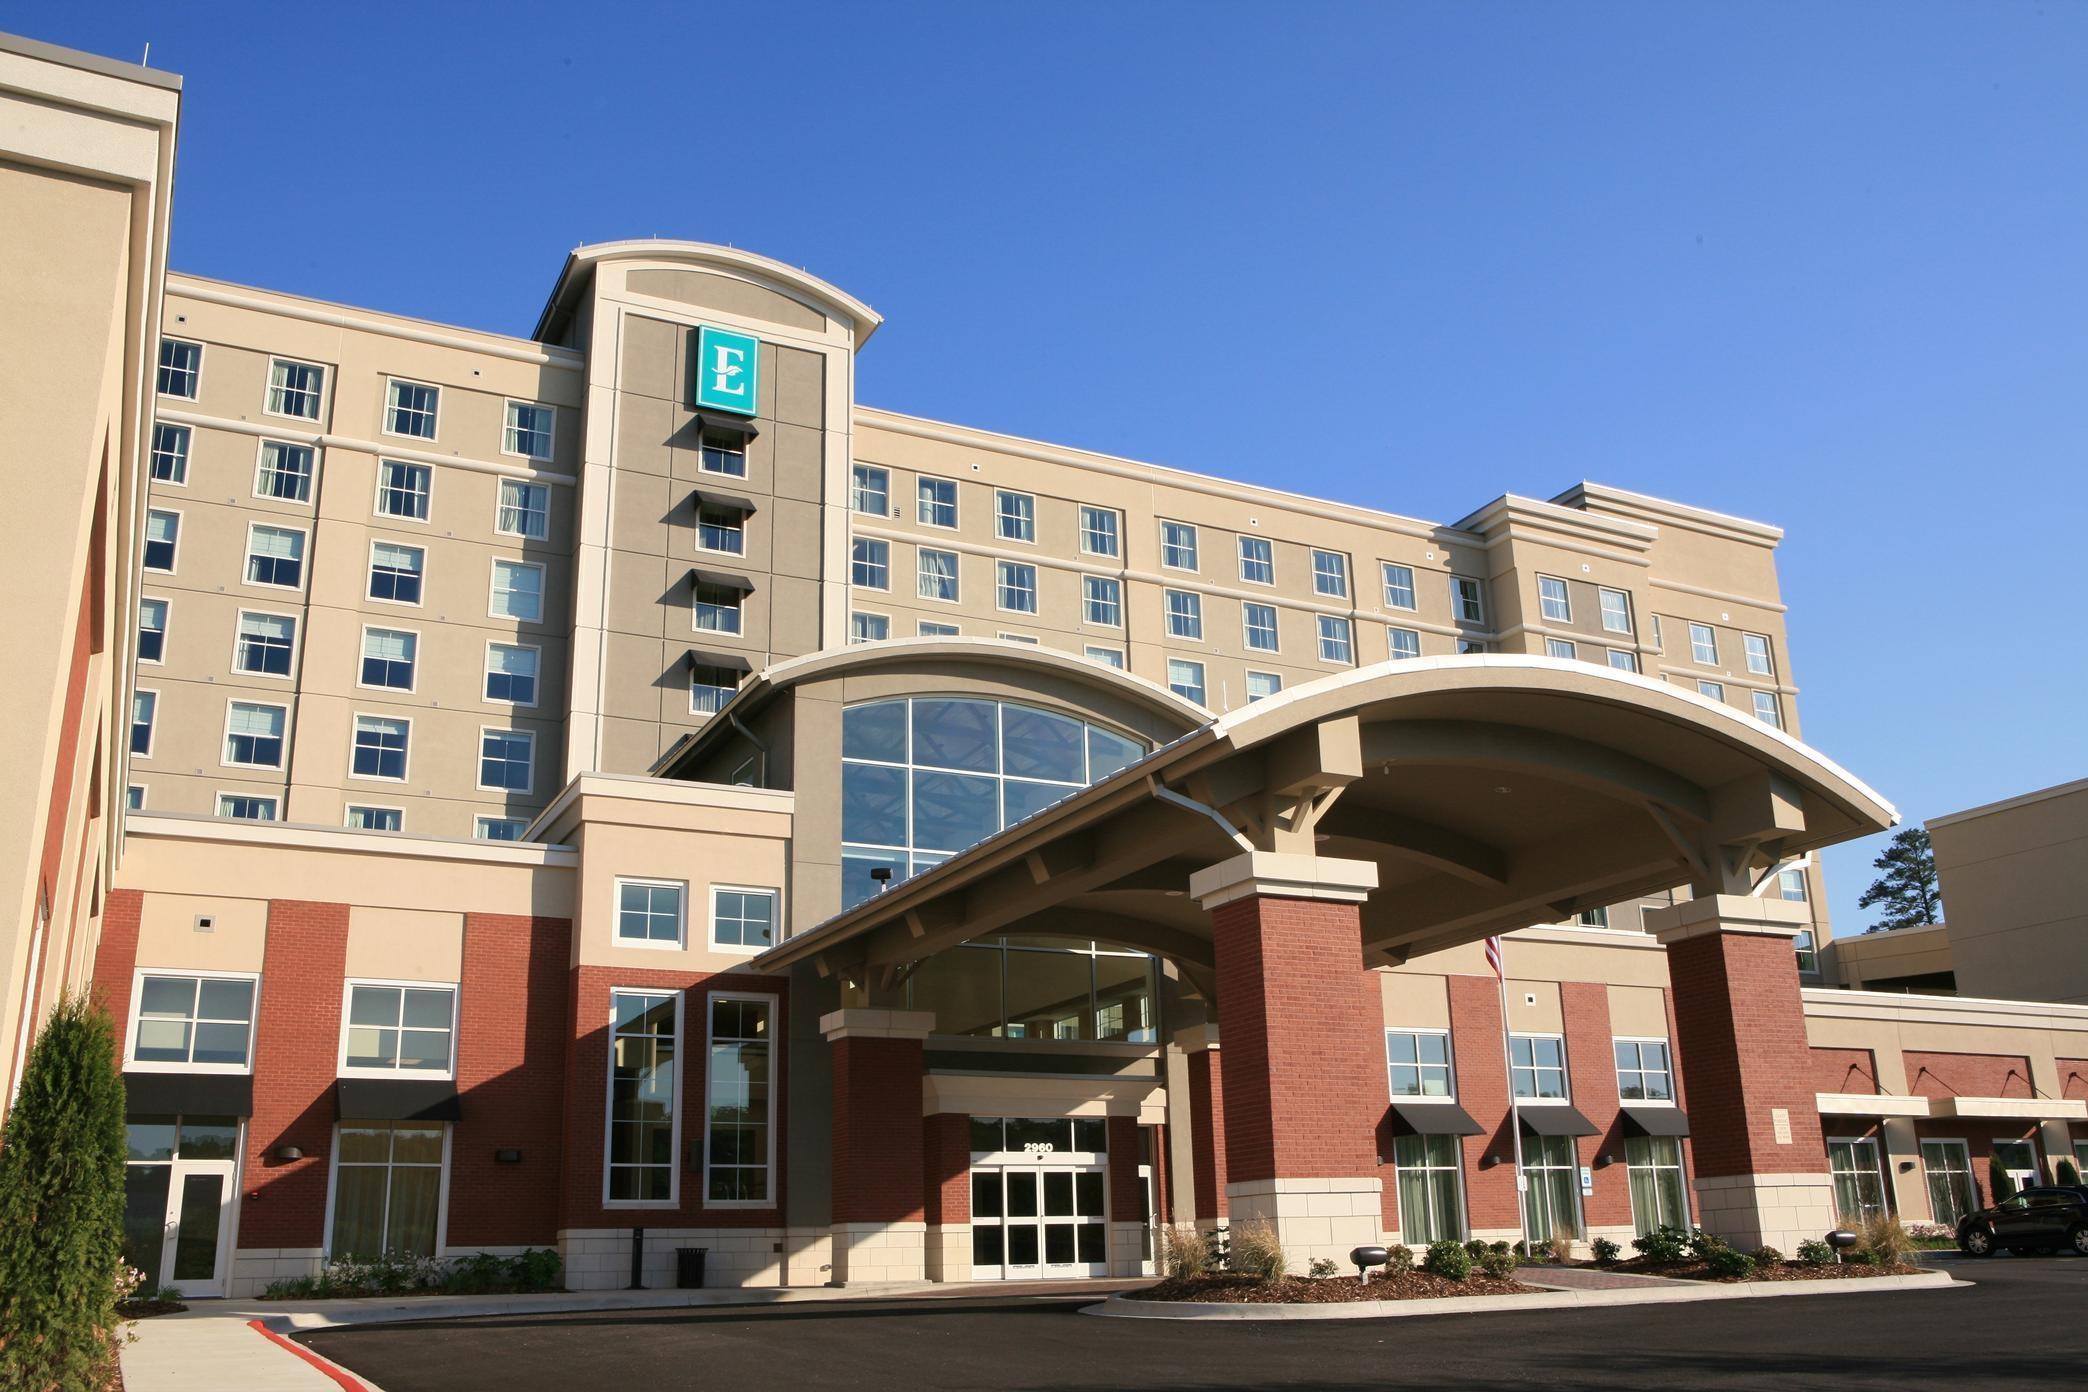 Embassy Suites by Hilton Birmingham Hoover image 1